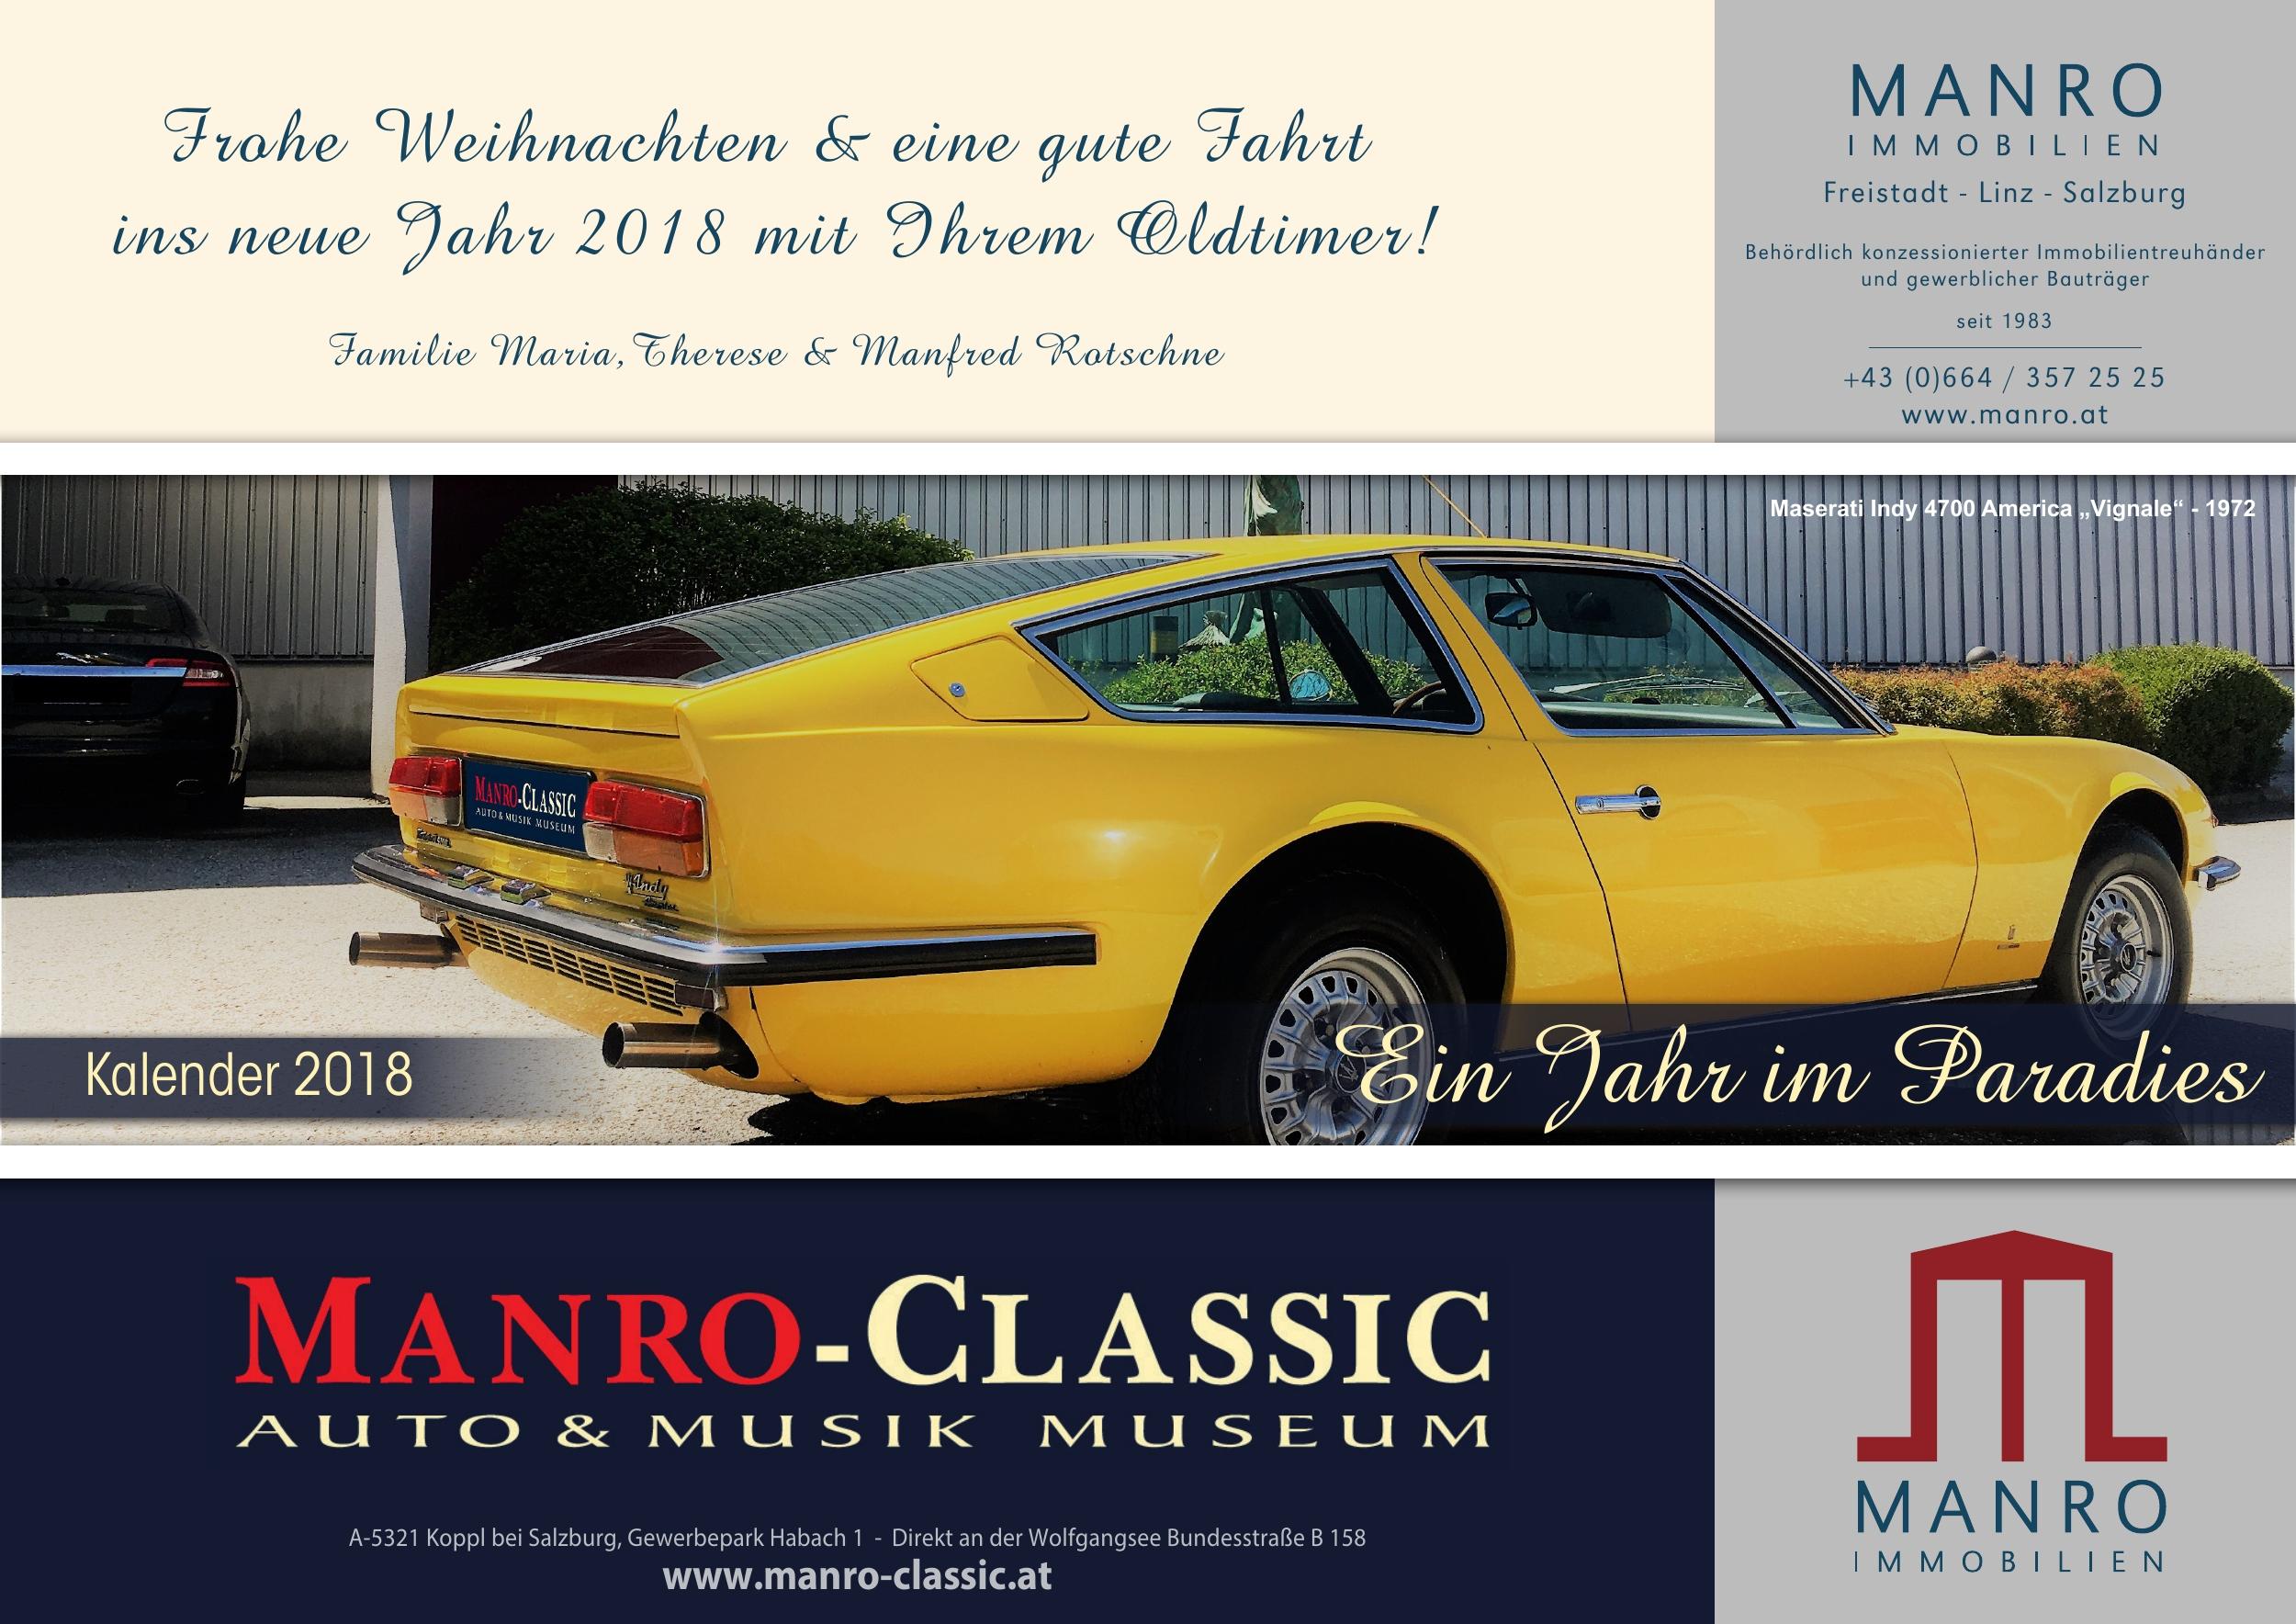 Frohe Weihnachten Hindi.00 Deckblatt Kalender 2018 Jpg Manro Classic Auto